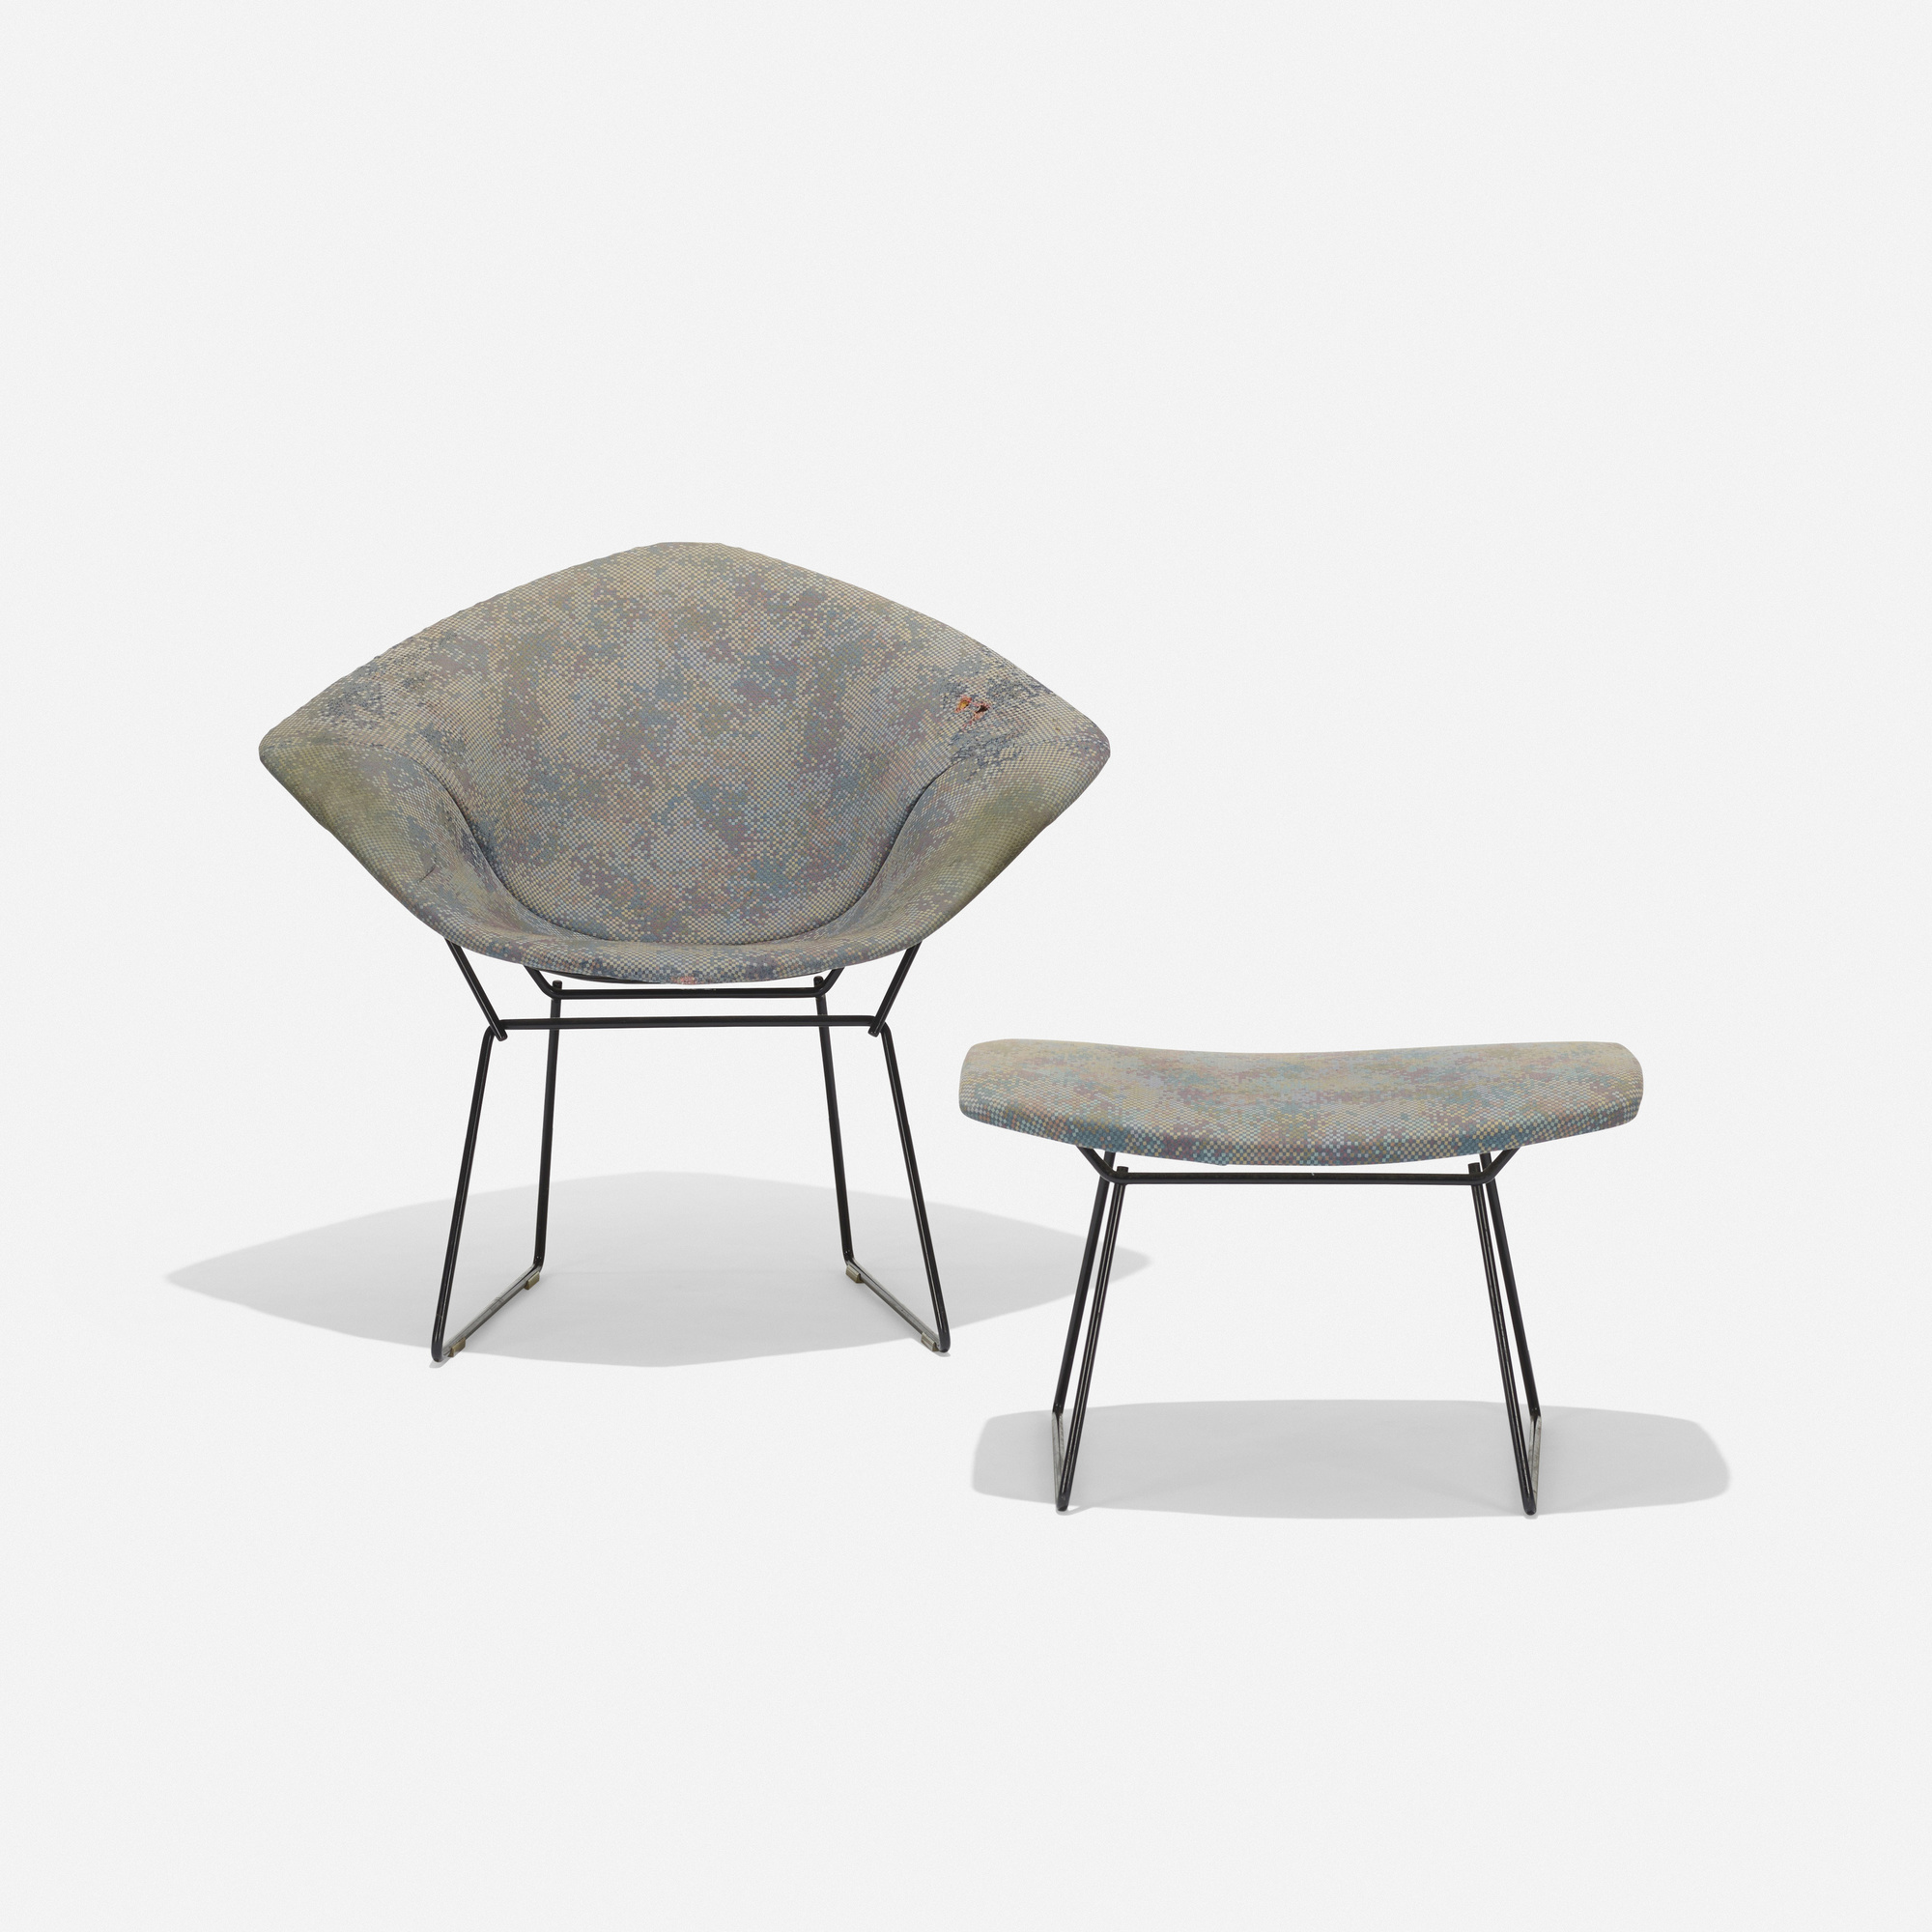 330 harry bertoia diamond chair and ottoman 2 of 3